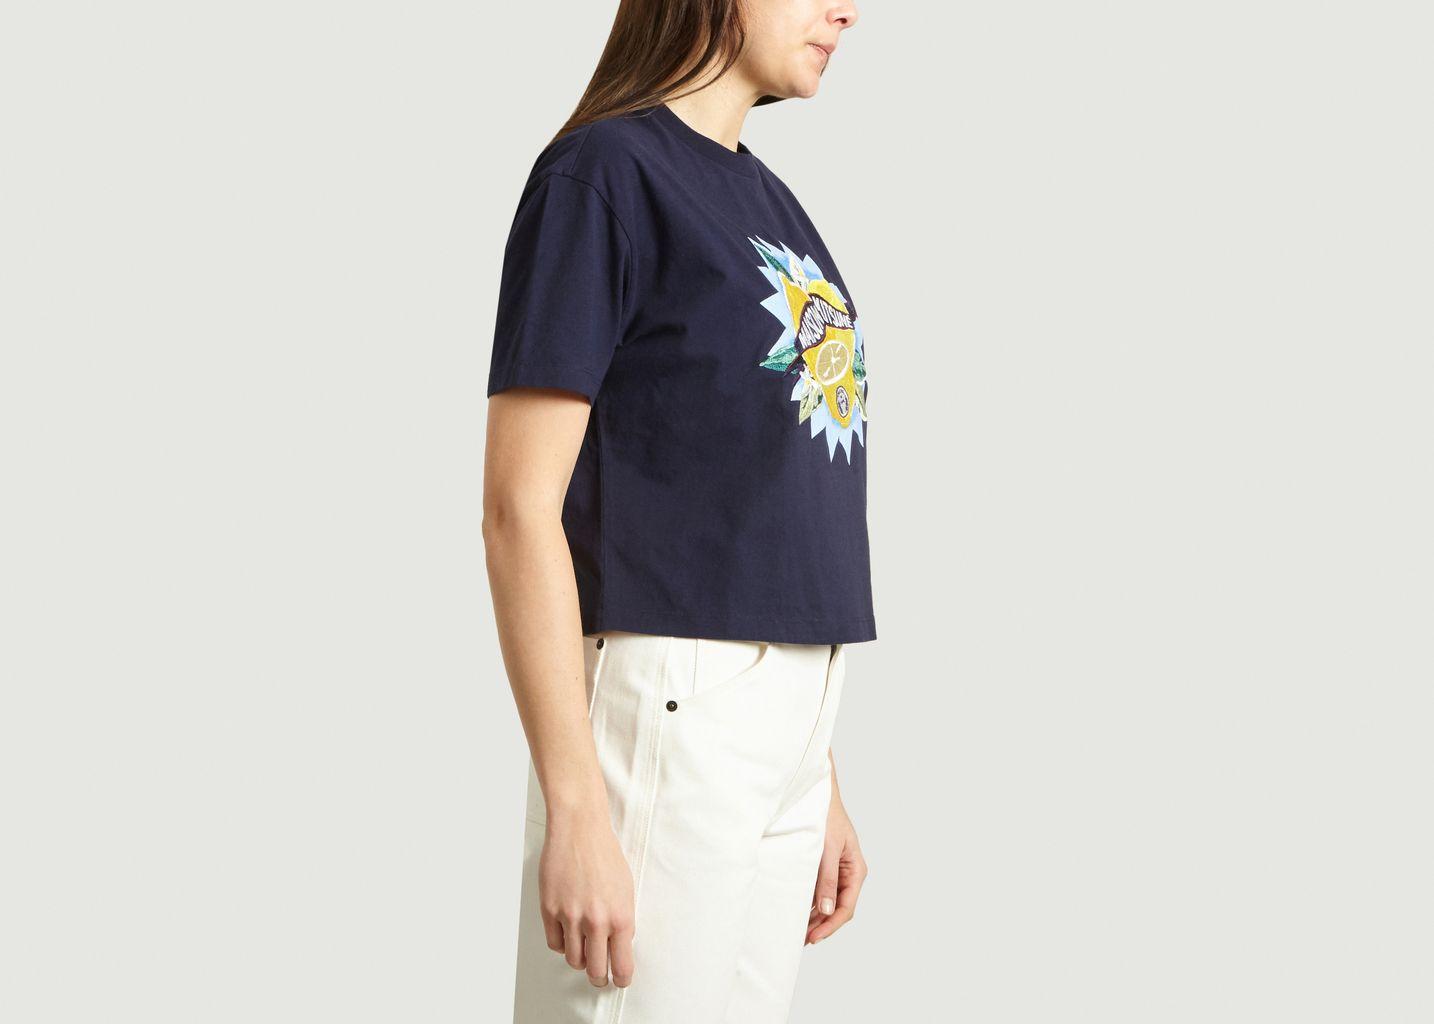 Tshirt Cropped Limone - Maison Kitsuné